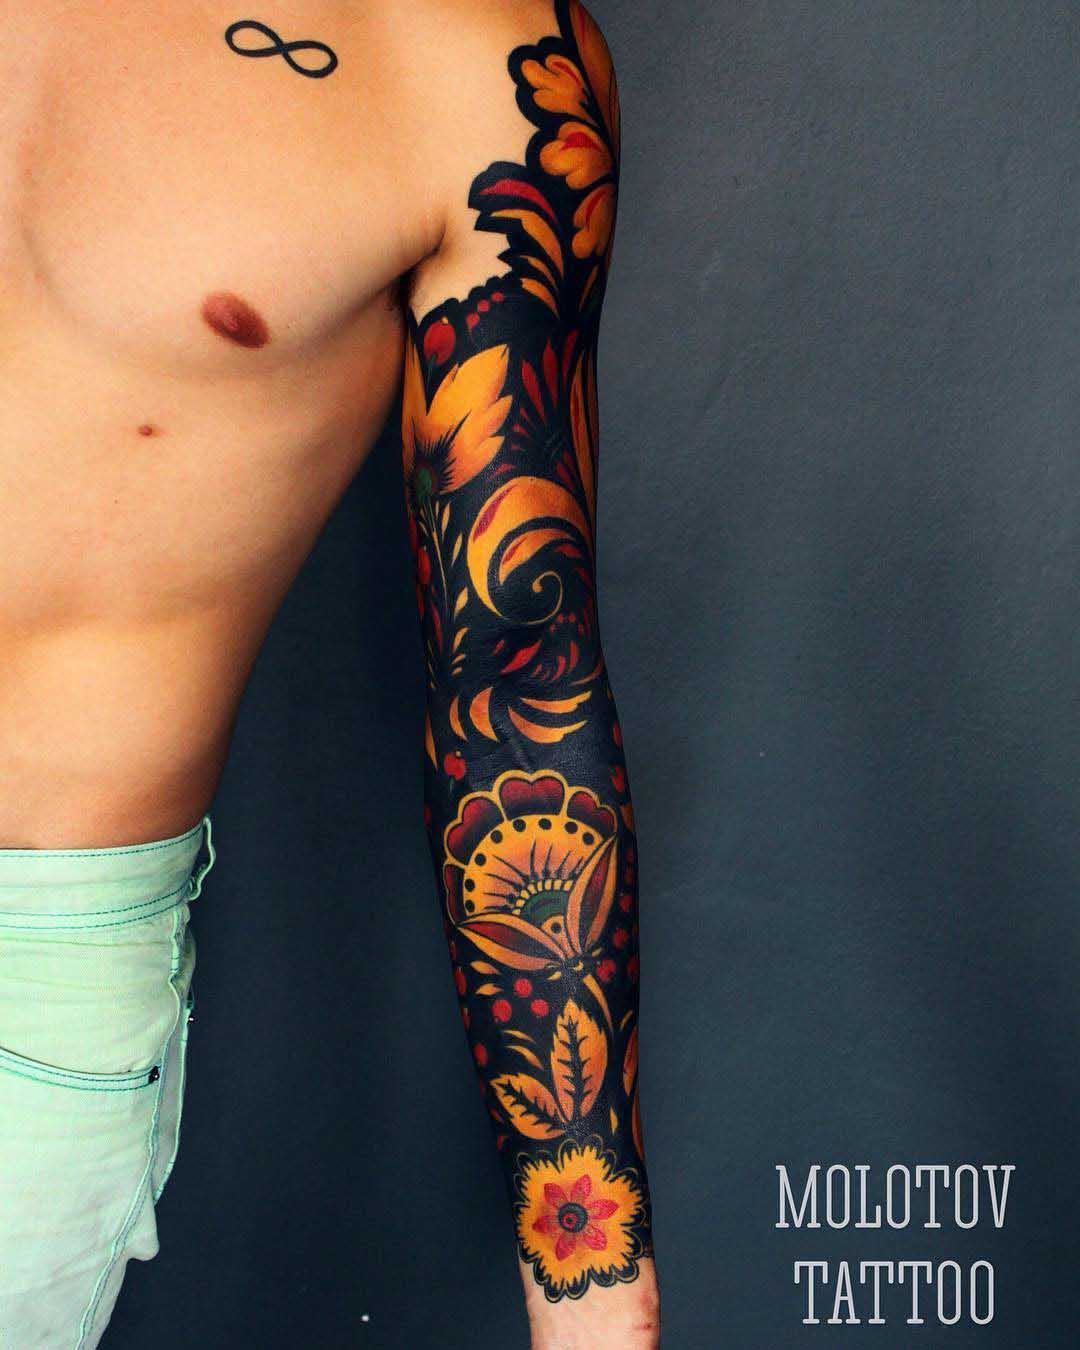 Tattoo ornament - ancient style of tattoos 73